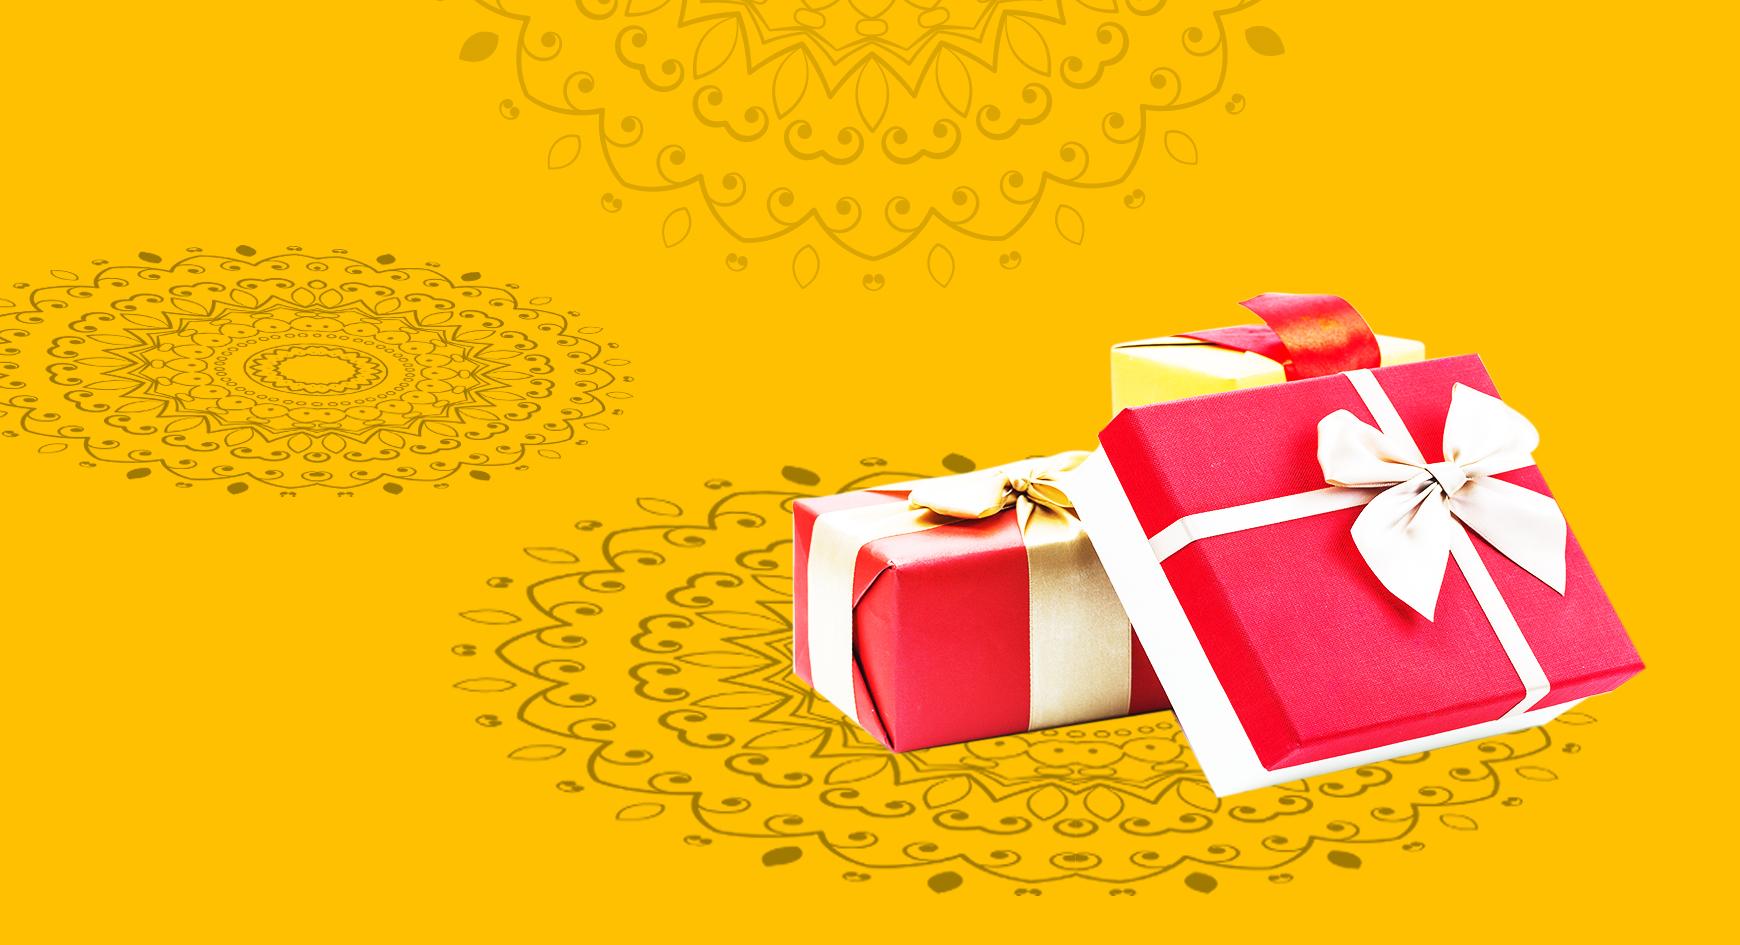 Diwali gifts ideas